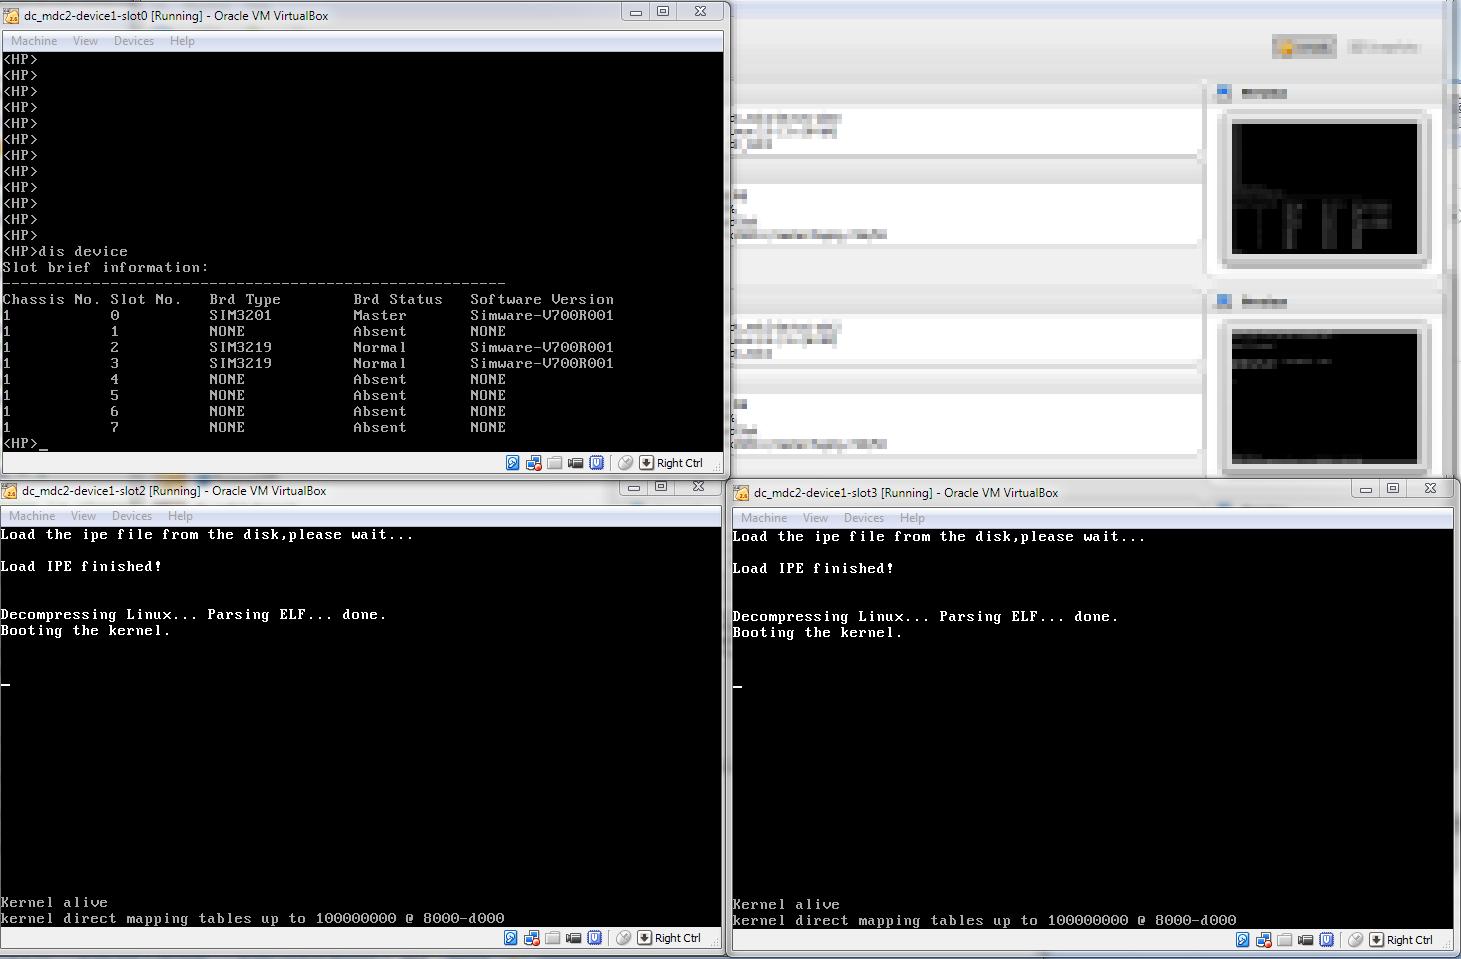 Simware 7 1 50 – Define custom linecard | About Aruba Networks